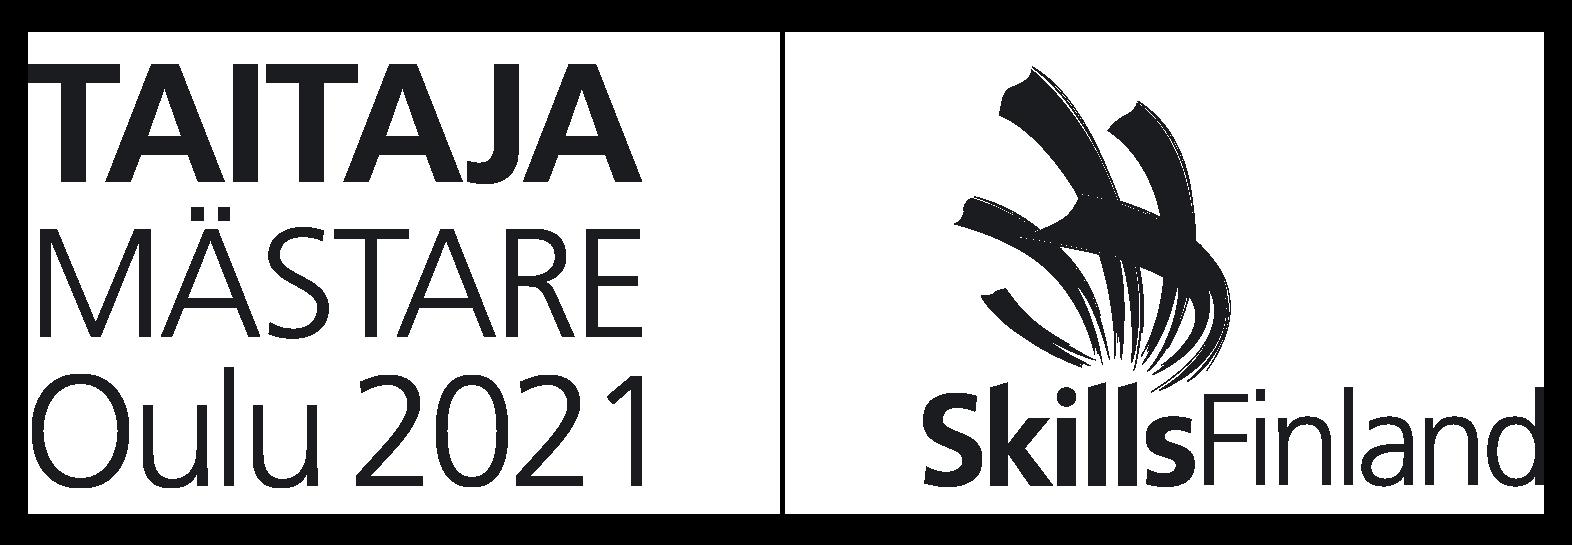 Taitaja2021 logo